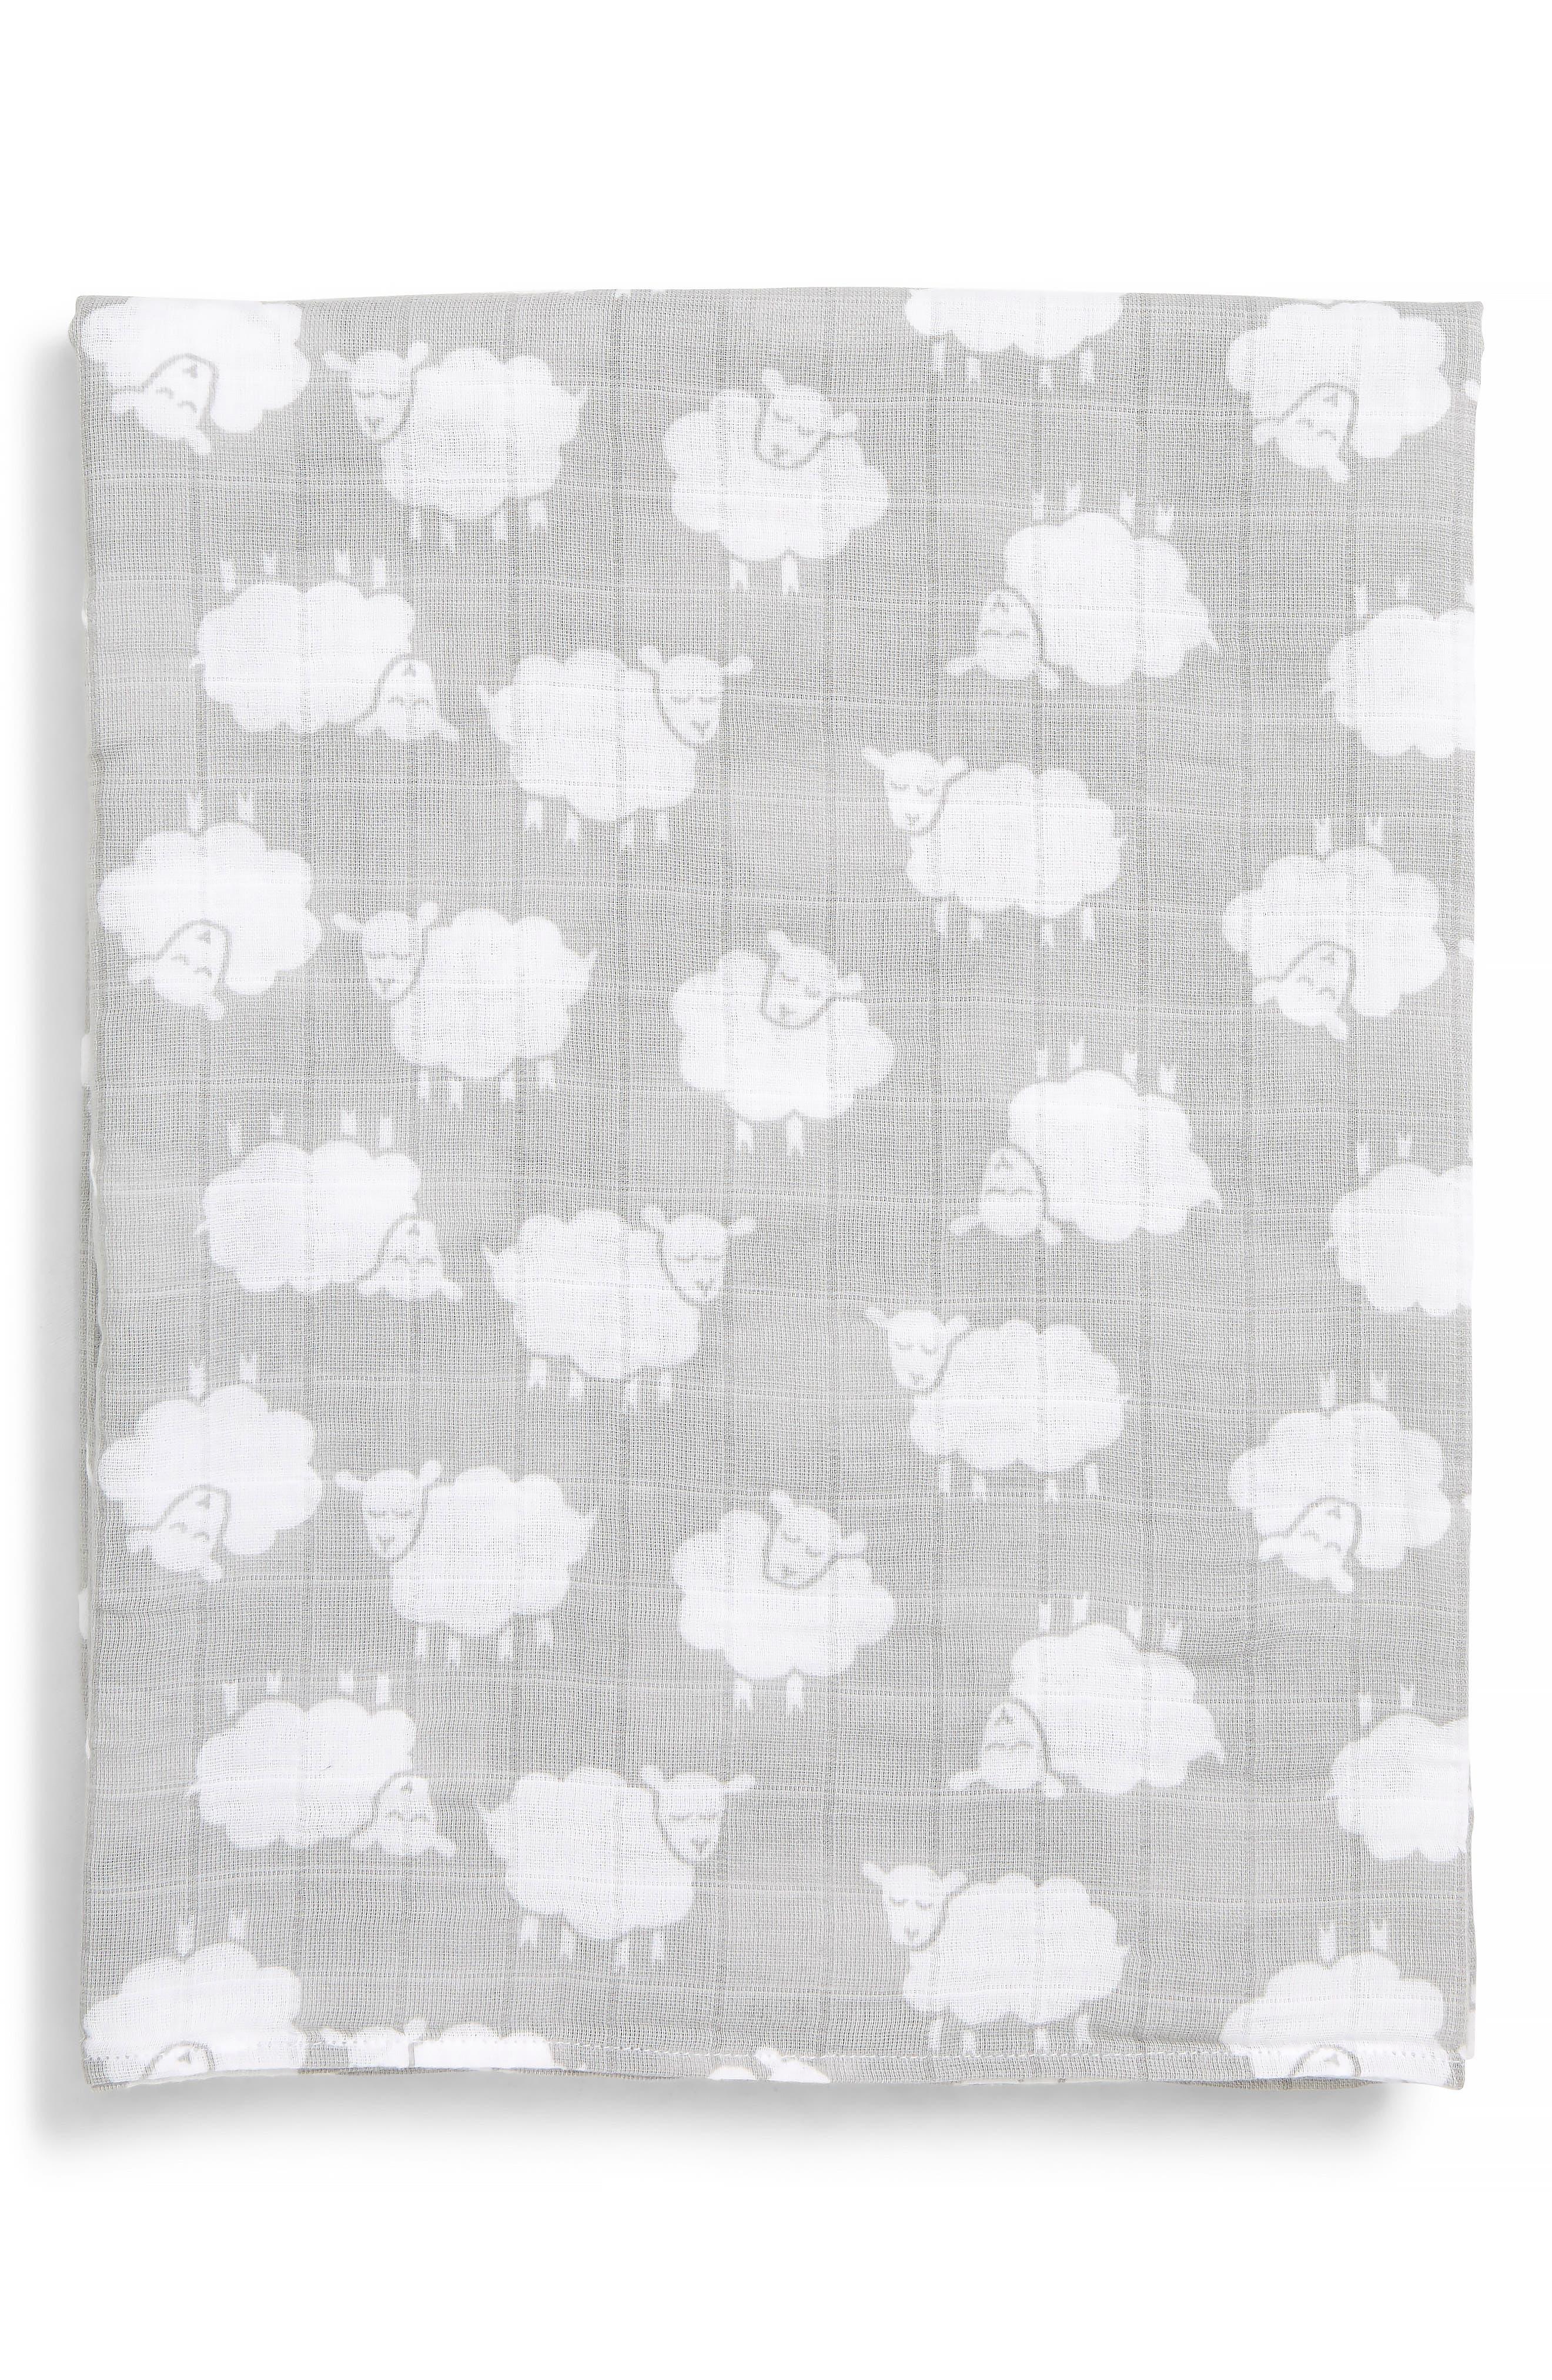 Cotton Swaddle Blanket,                             Main thumbnail 1, color,                             GREY MICRO SHEEP